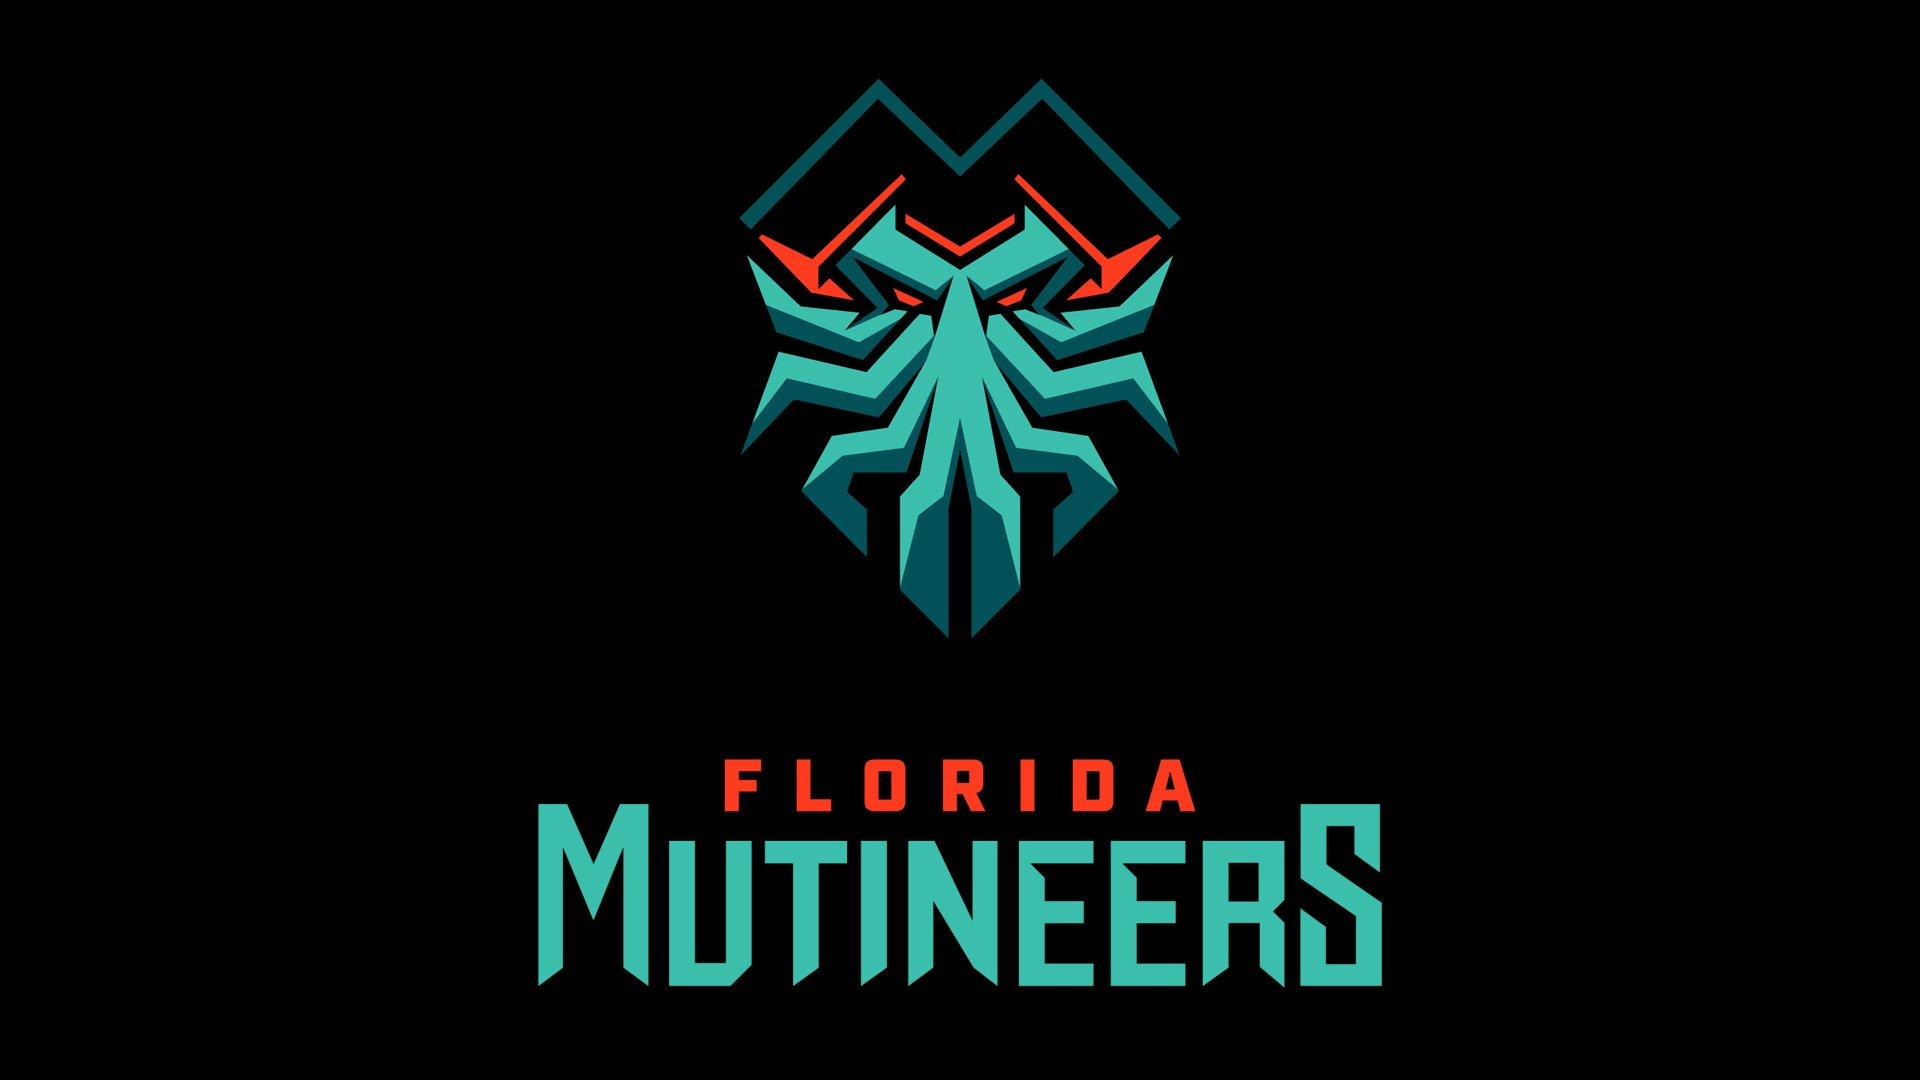 Florida Mutineers sign Owakening